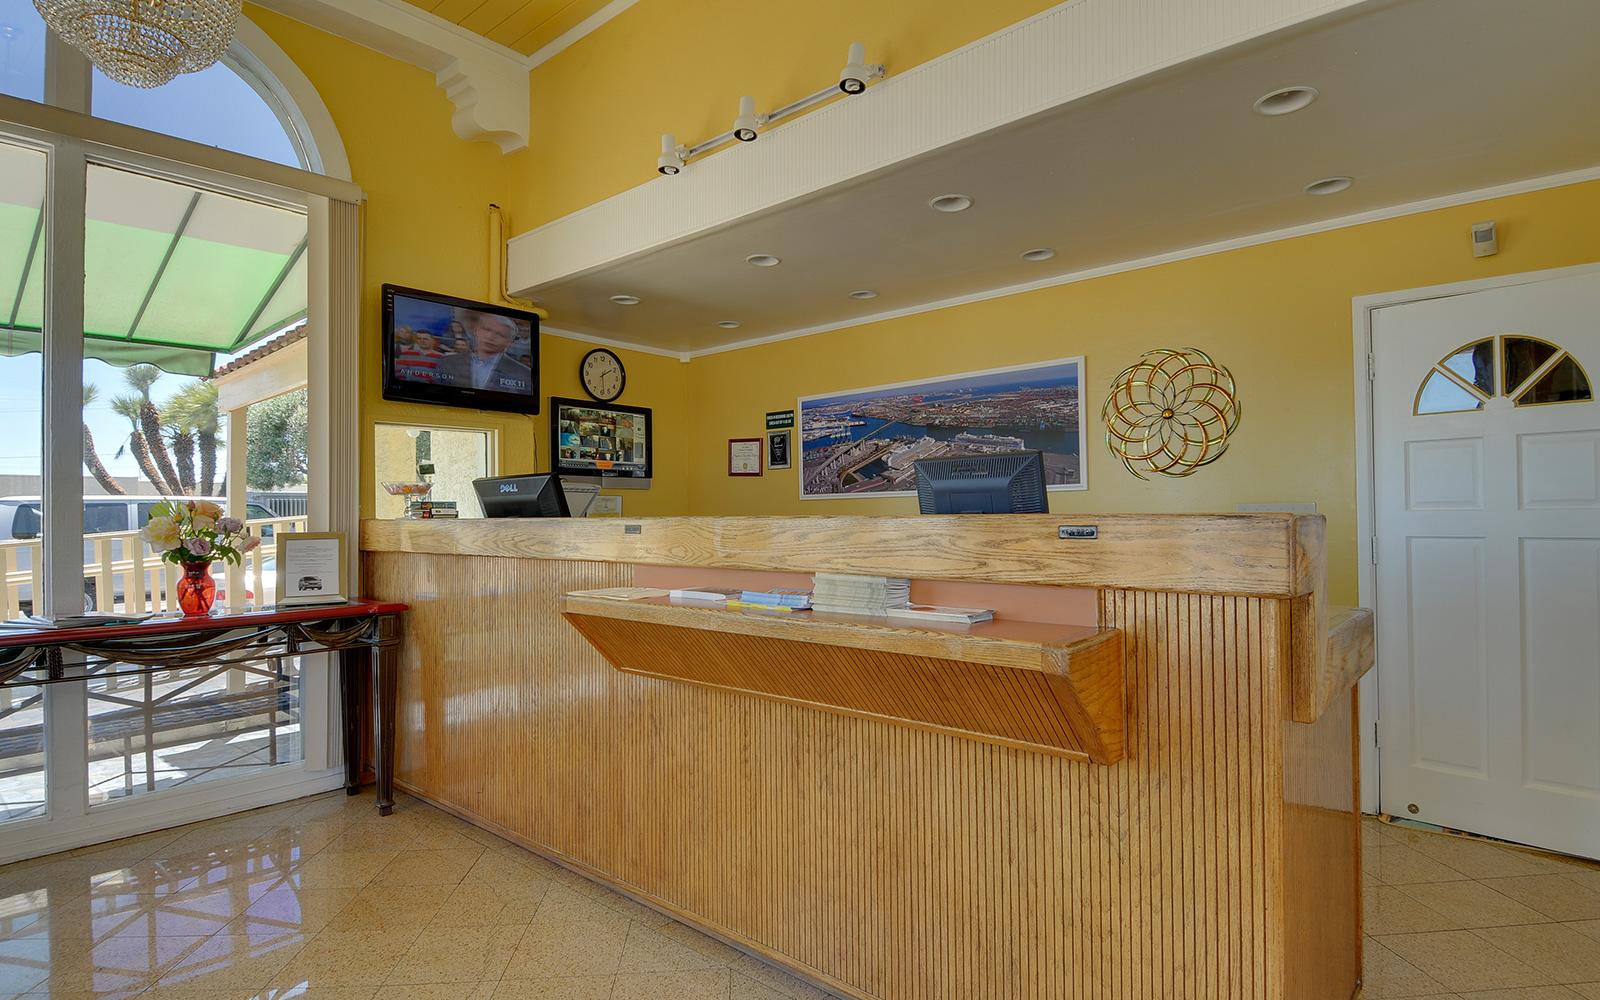 California Hotel Customer Service Vagabond Inn Hotels